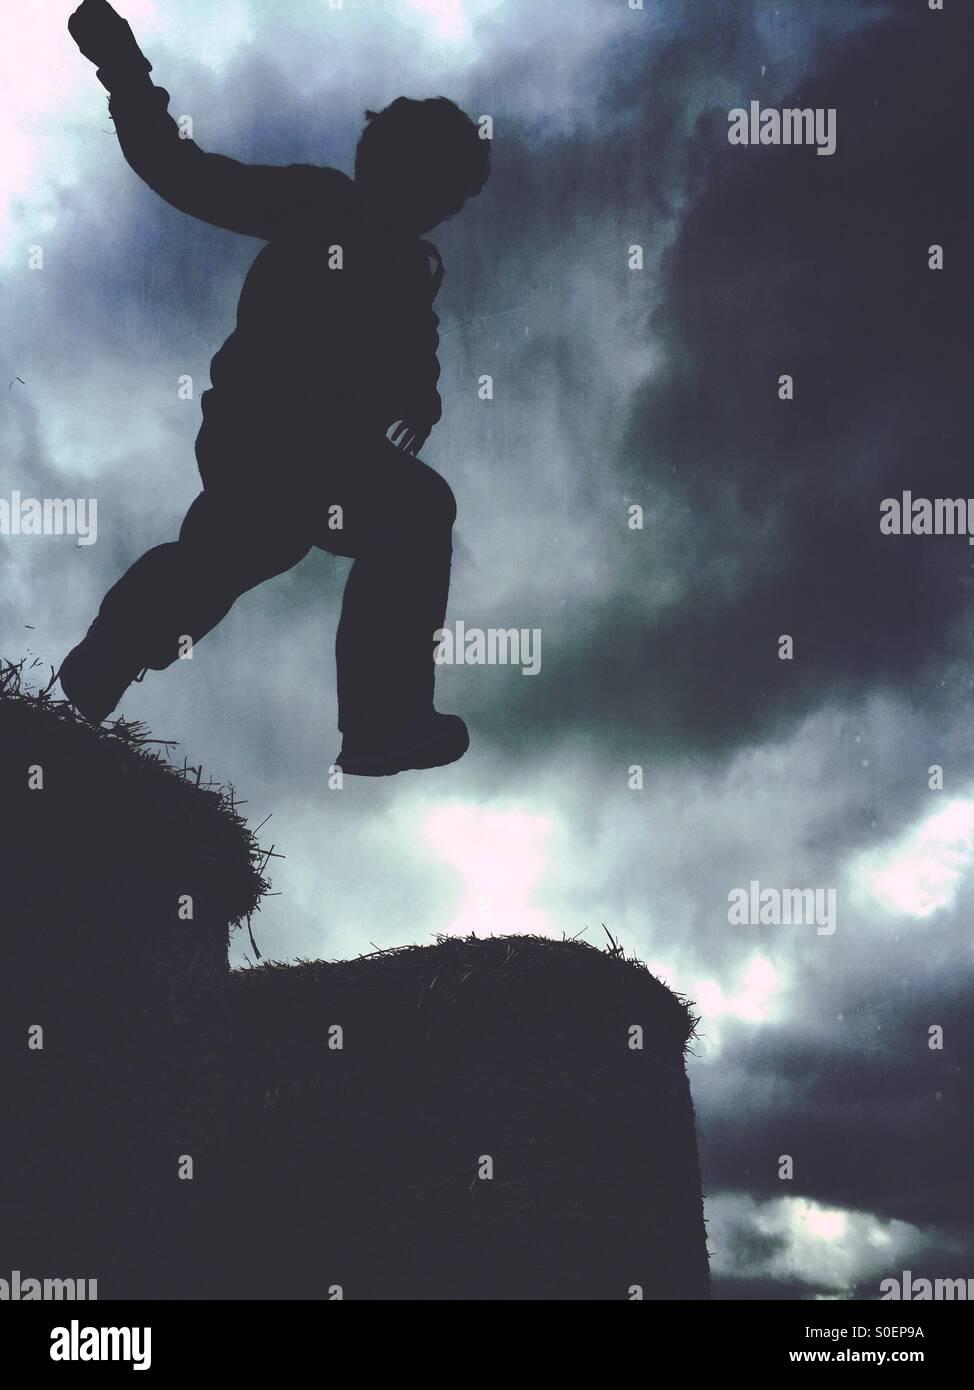 Silueta de un muchacho saltando Imagen De Stock